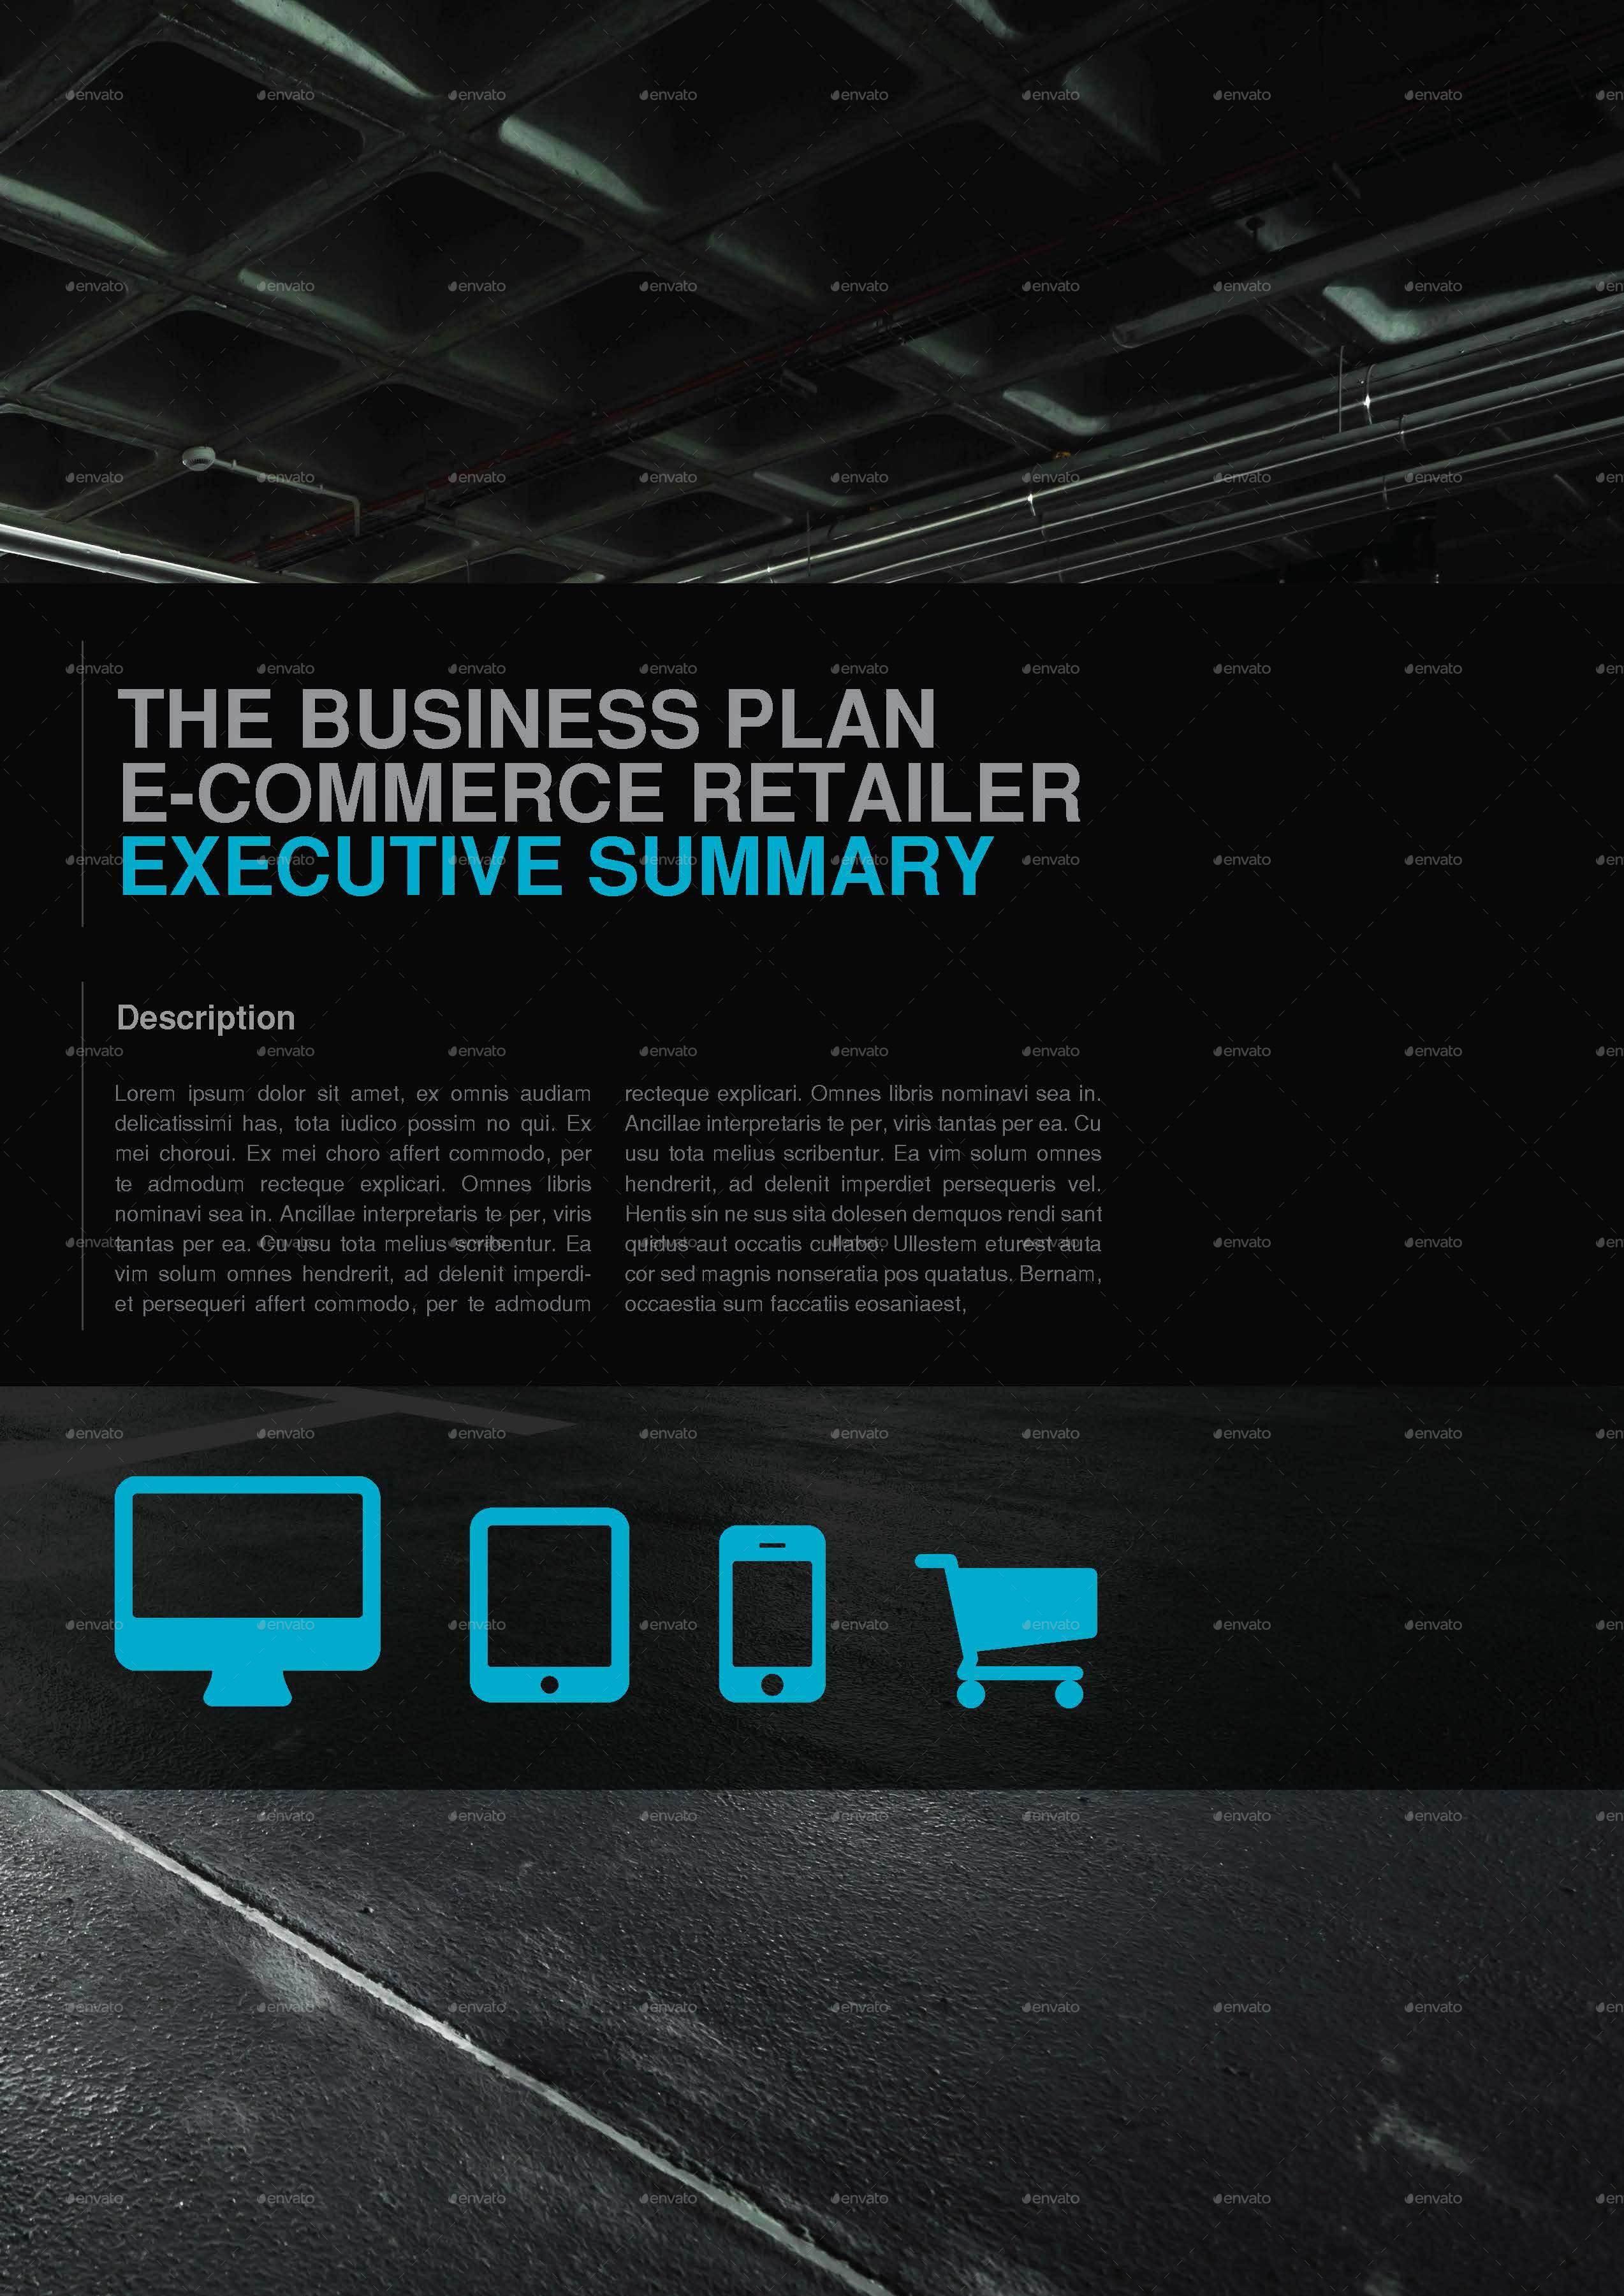 the business plan ecommerce retailer kfea 1jpg the business plan dark version_page_01jpg the business plan dark version_page_02jpg